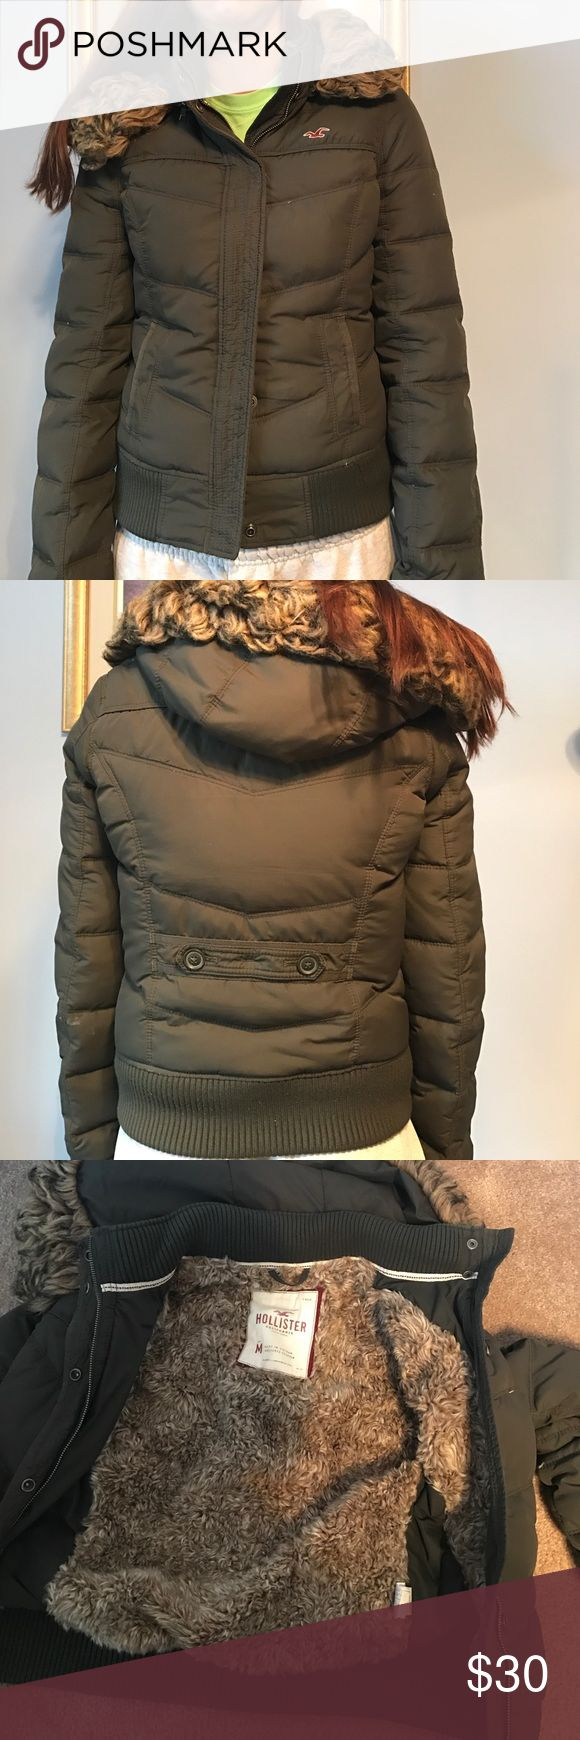 Hollister coat Gently worn but still a lot of life left. Hollister Jackets & Coats